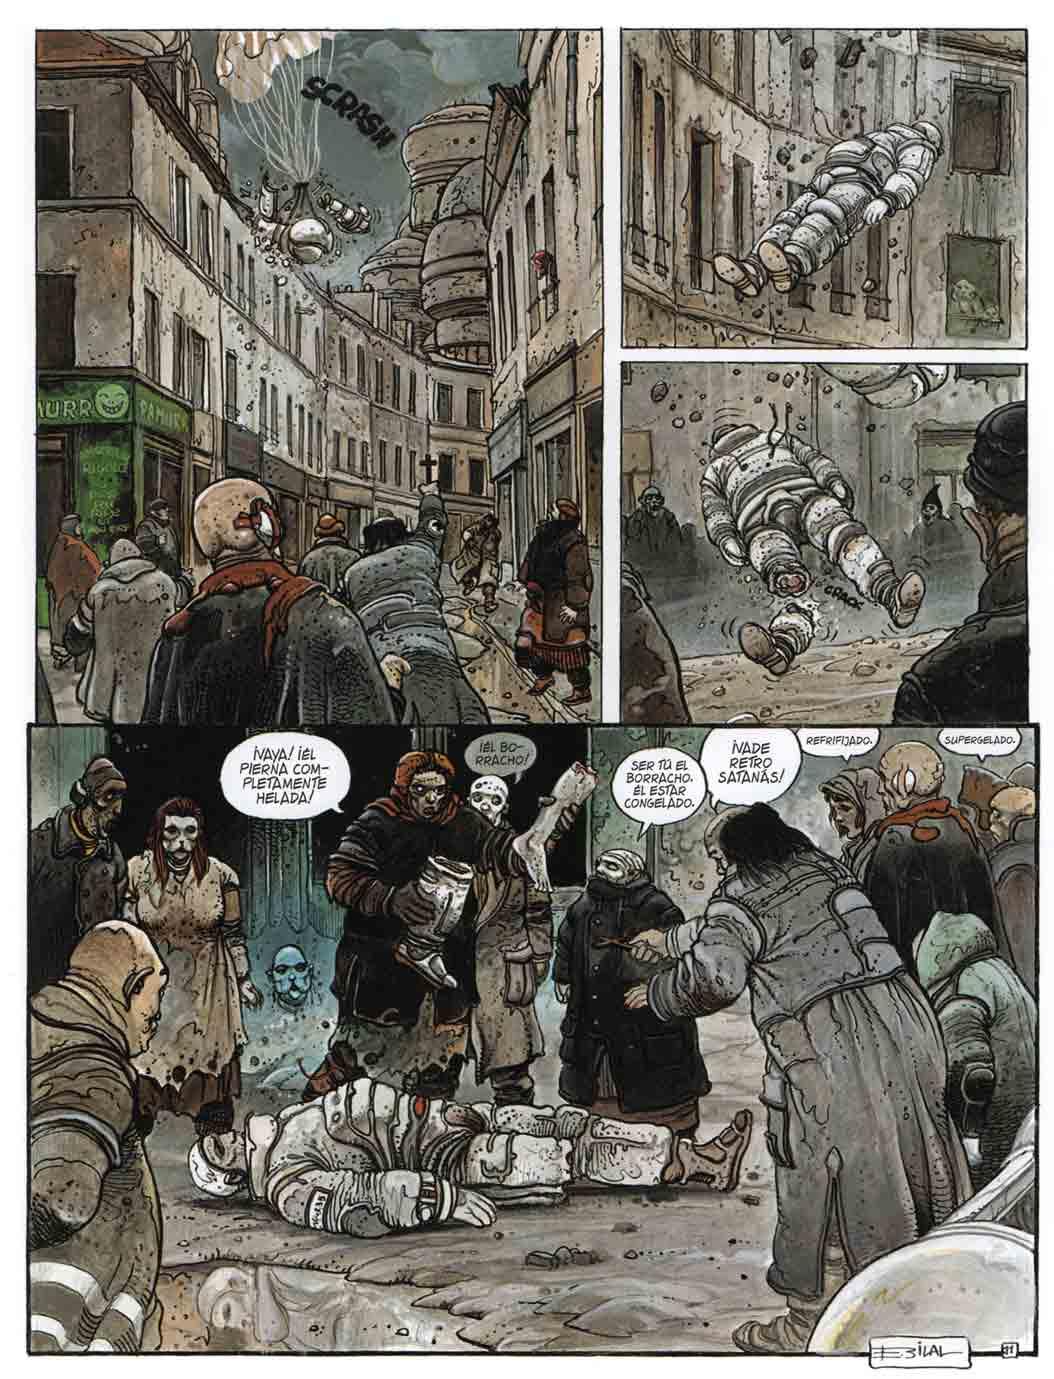 La-trilogia-nikopol-enki-bilal-golem-comics-bd-comic-03